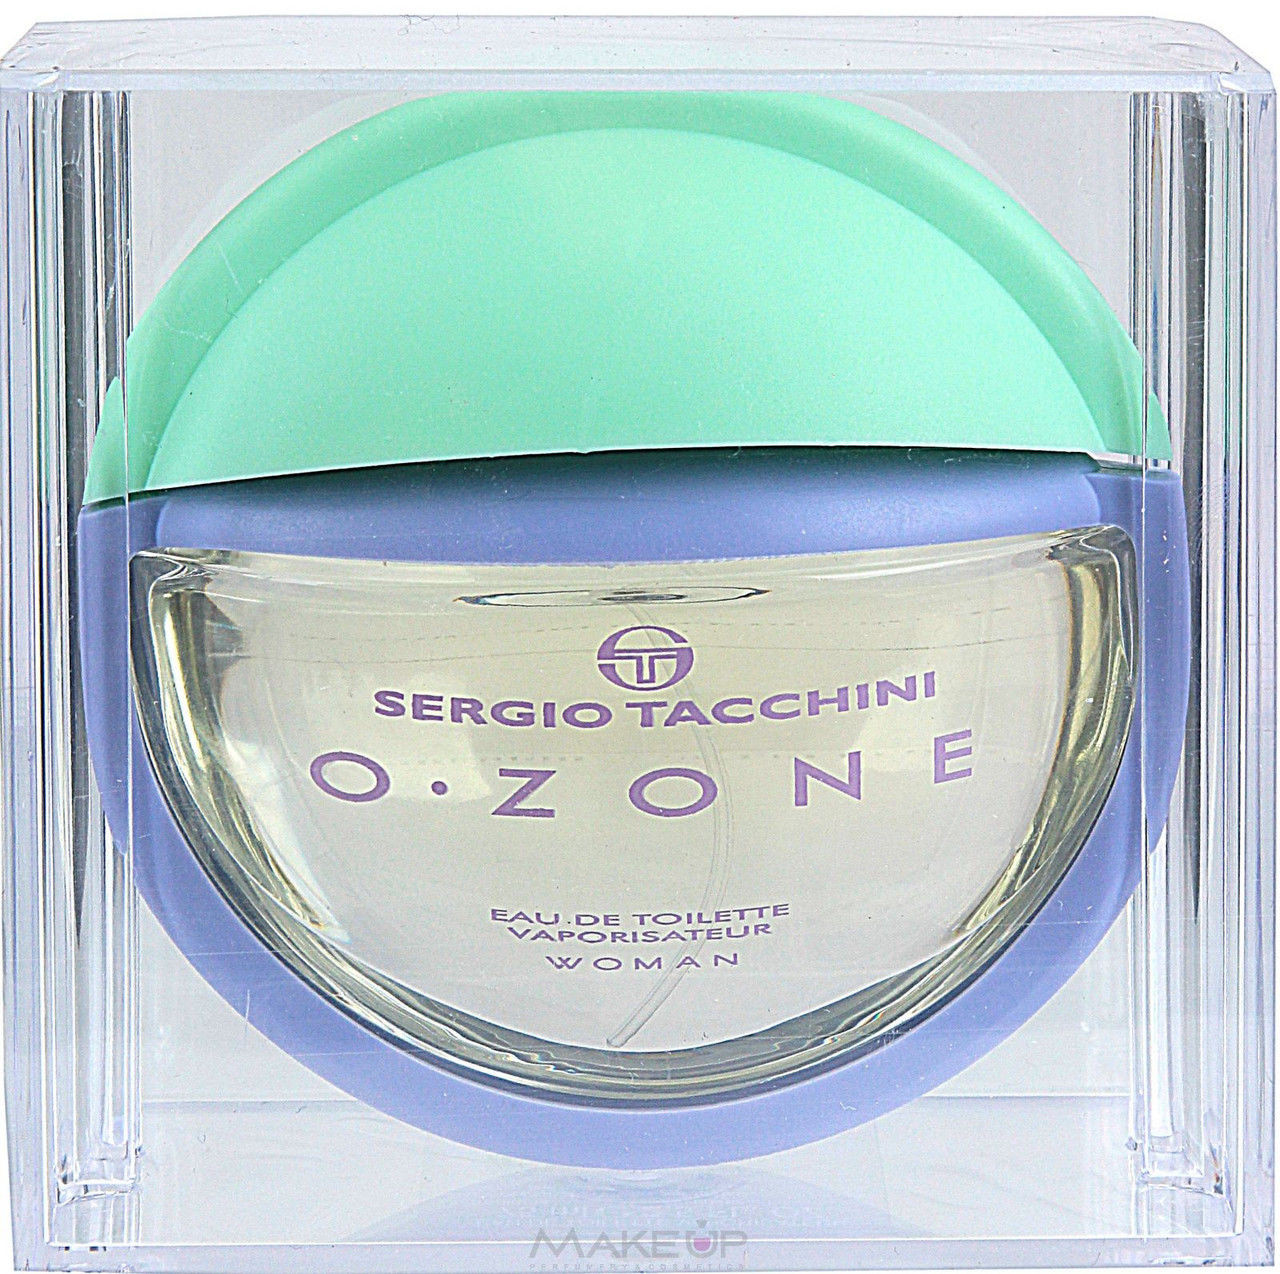 86b44997a257 Sergio Tacchini O•zone Woman 50ml (tester) женская оригинальная парфюмерия  - ИНТЕРНЕТ МАГАЗИН